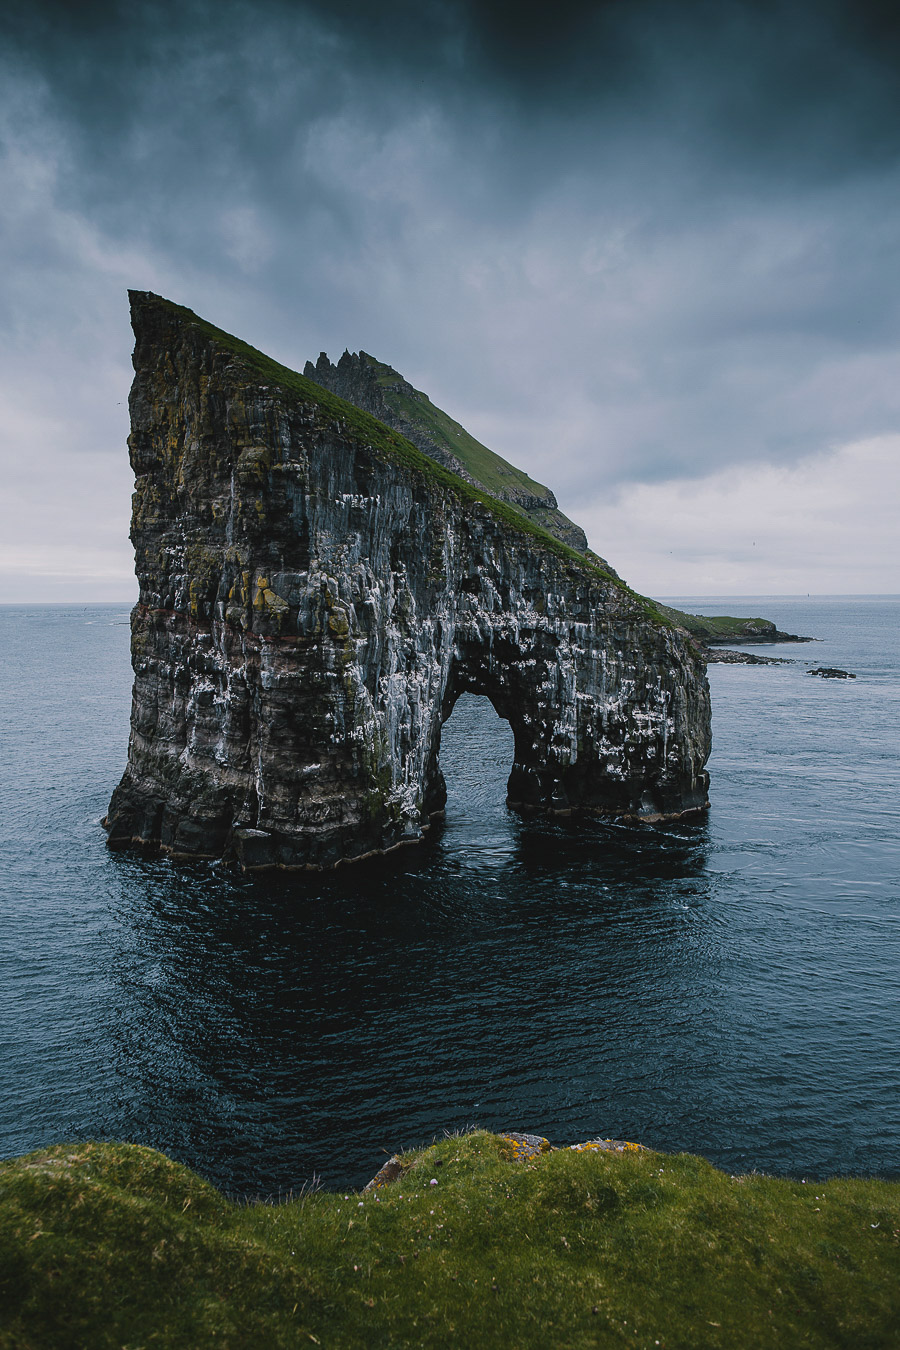 Drangarnir arche of Faroe Islands